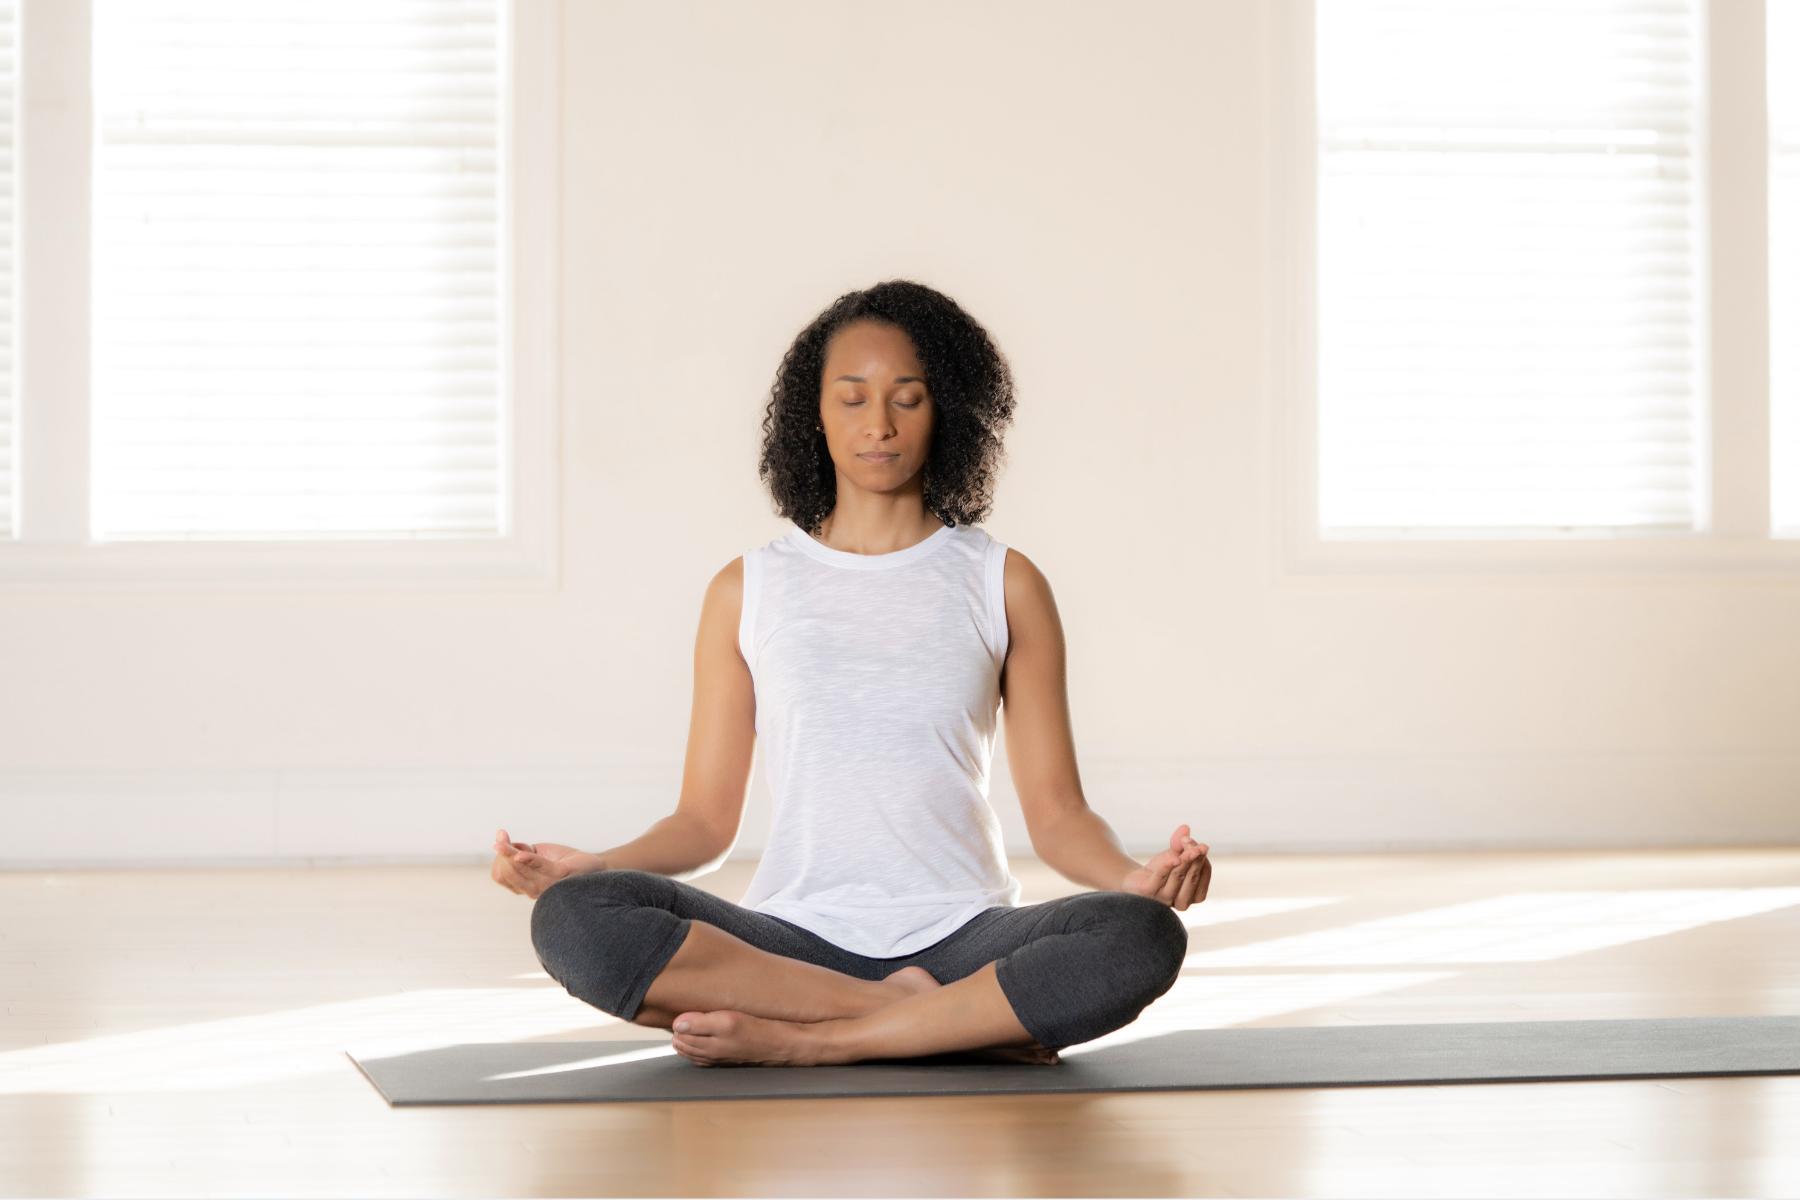 woman meditating on a mat